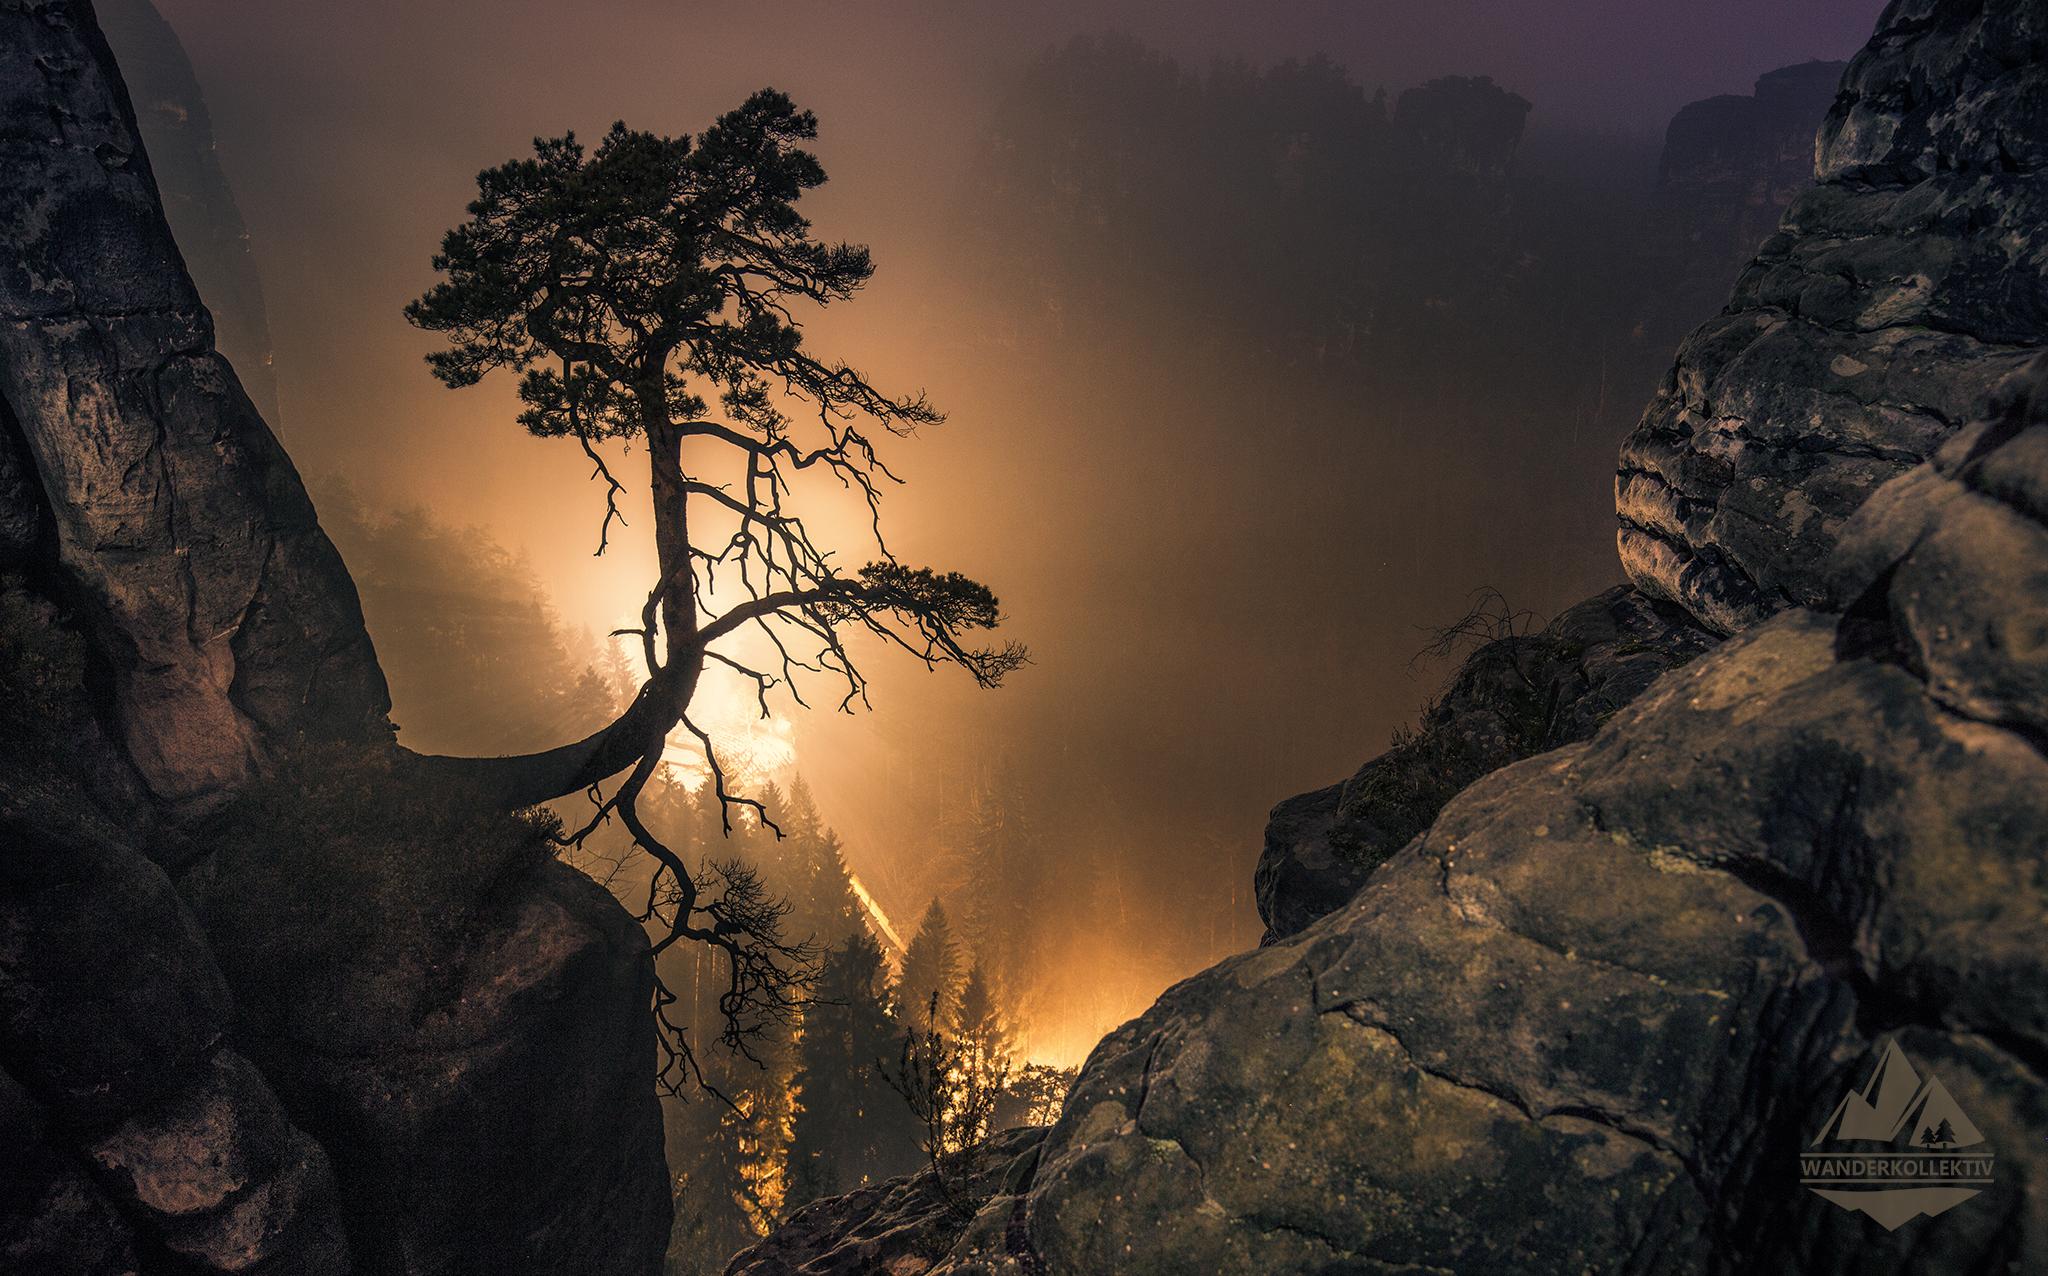 Wetterkiefer bei der Bastei  - Elbsandsteingebirge, Germany